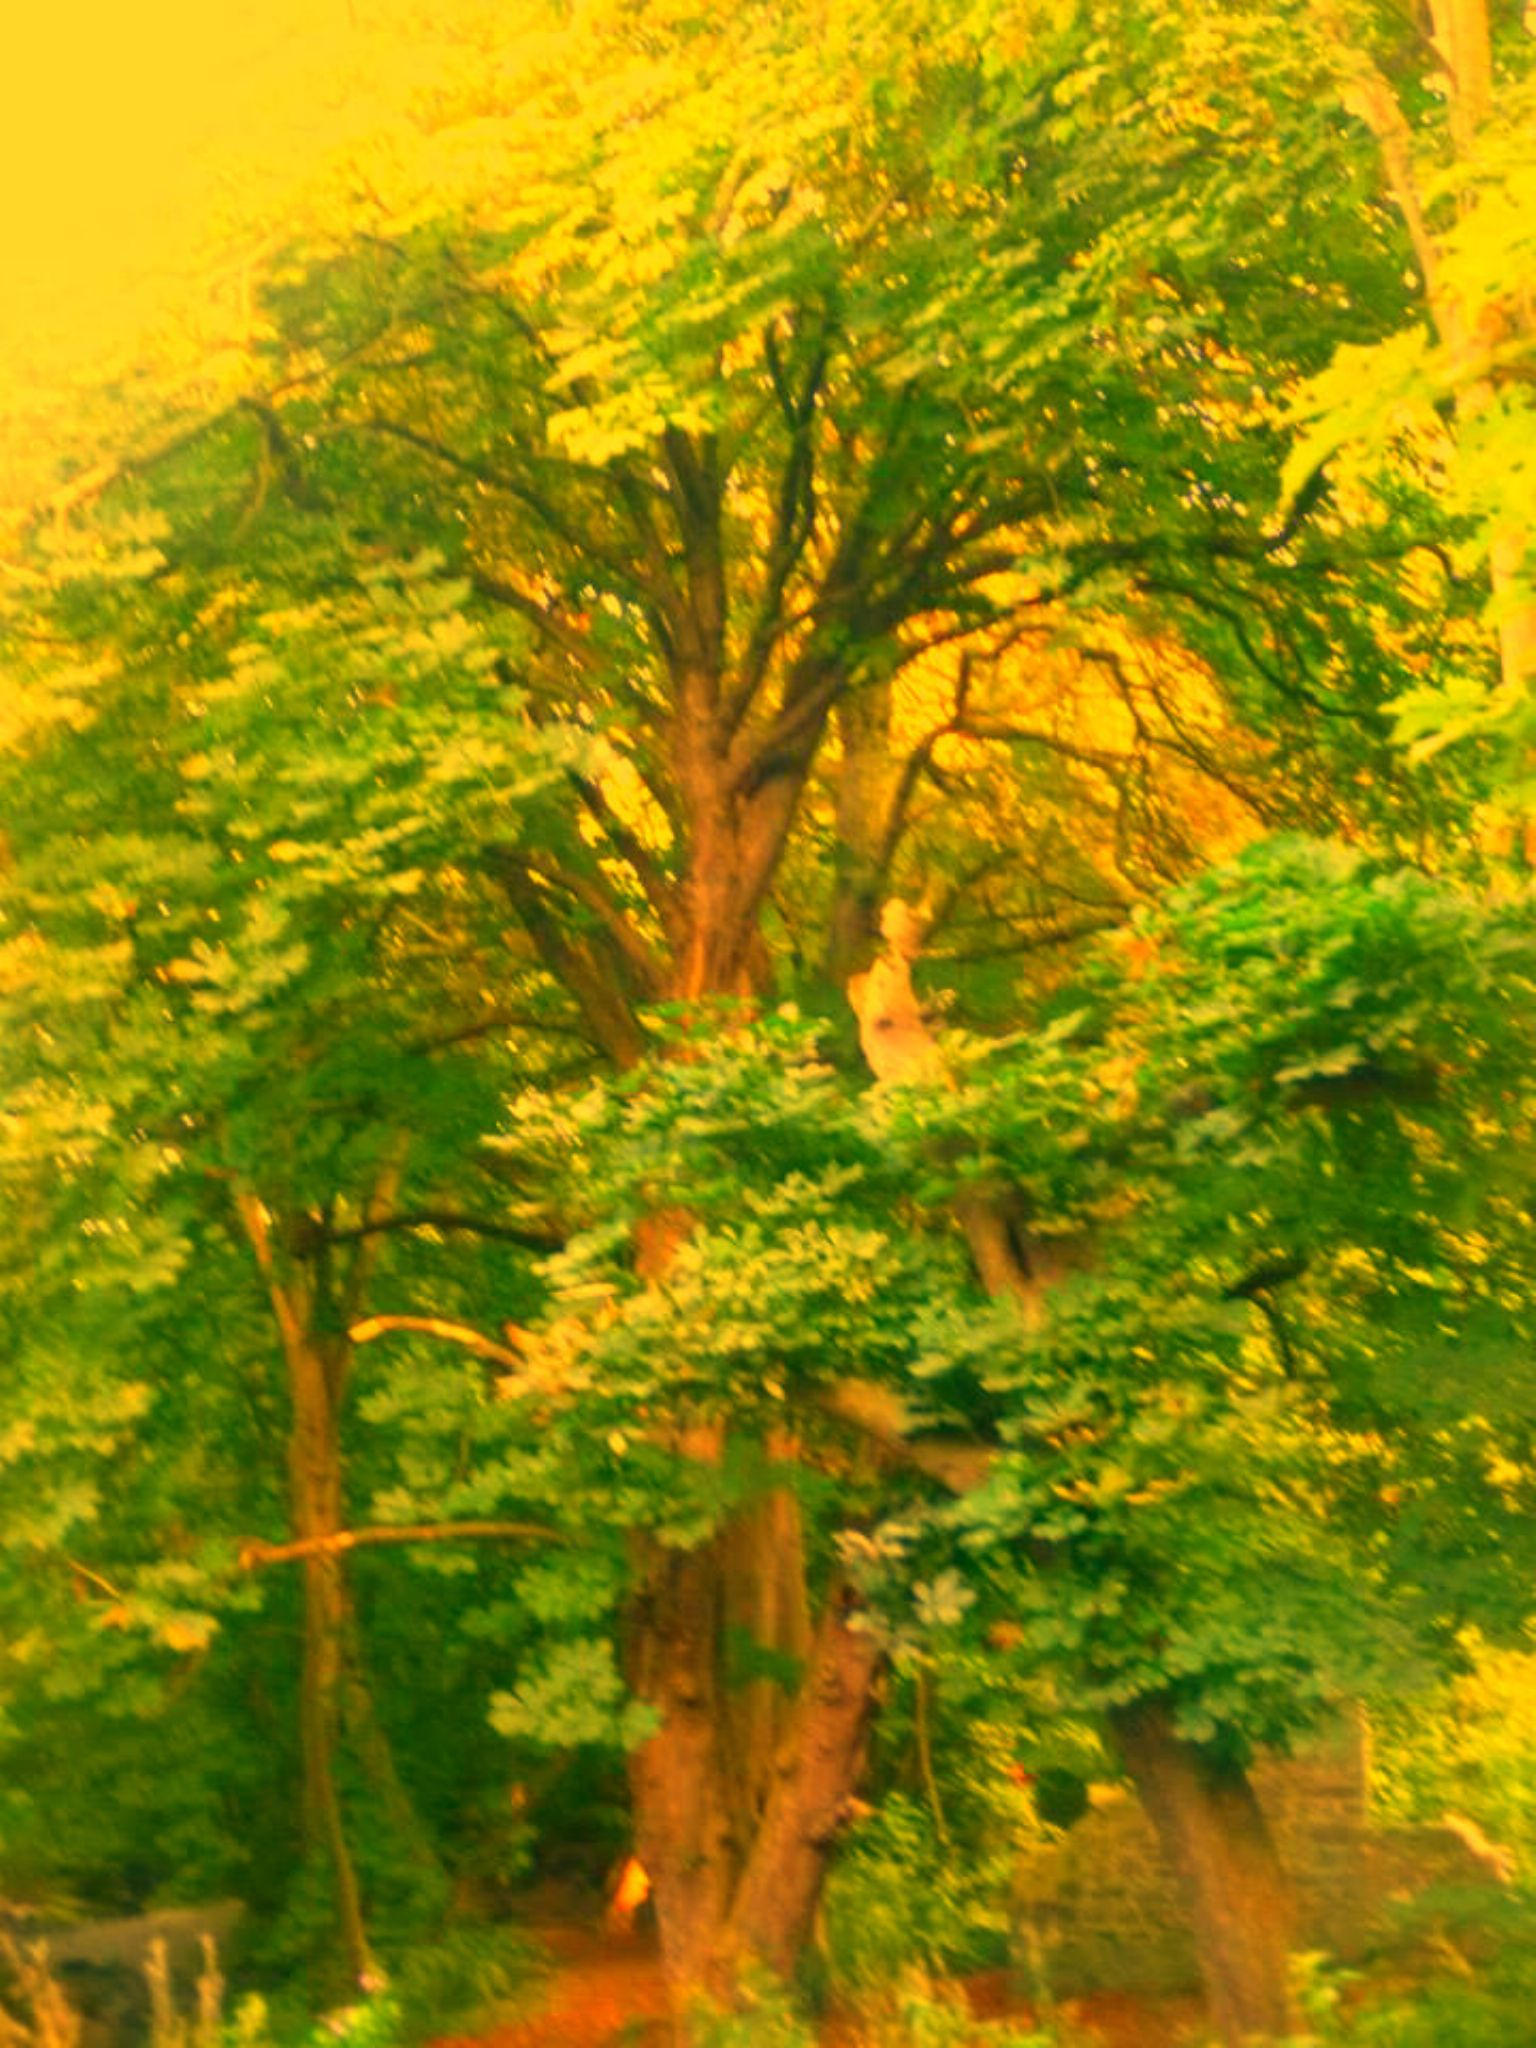 tree by chris.adams.3557